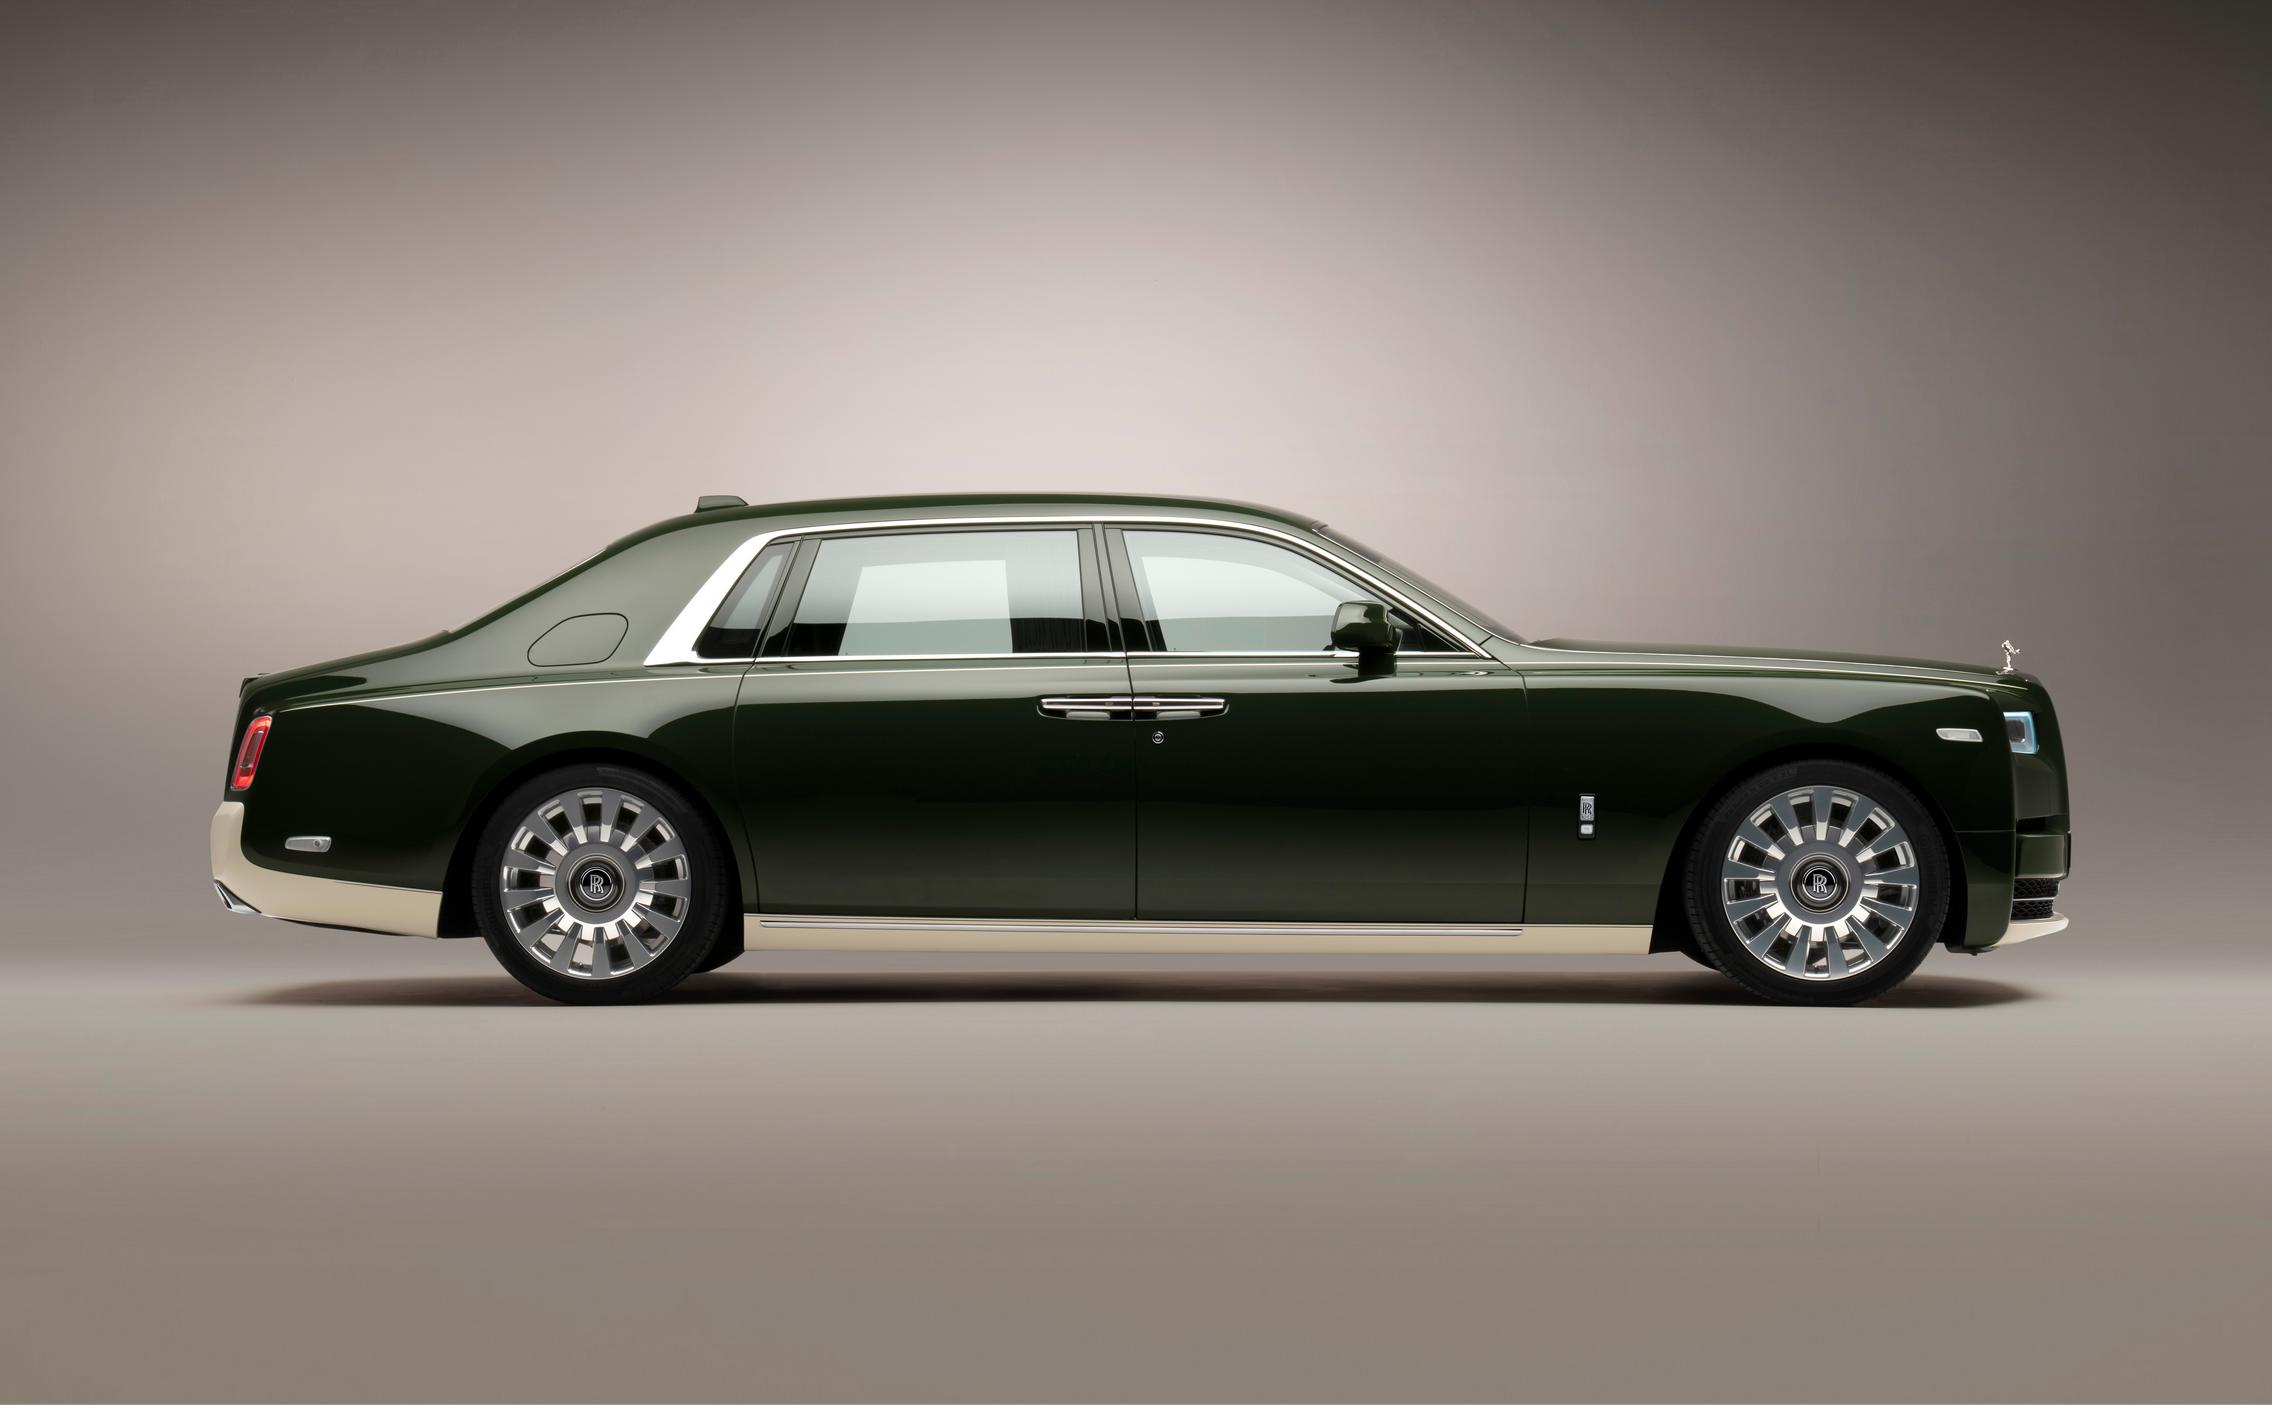 Hermes Rolls-Royce Phantom side